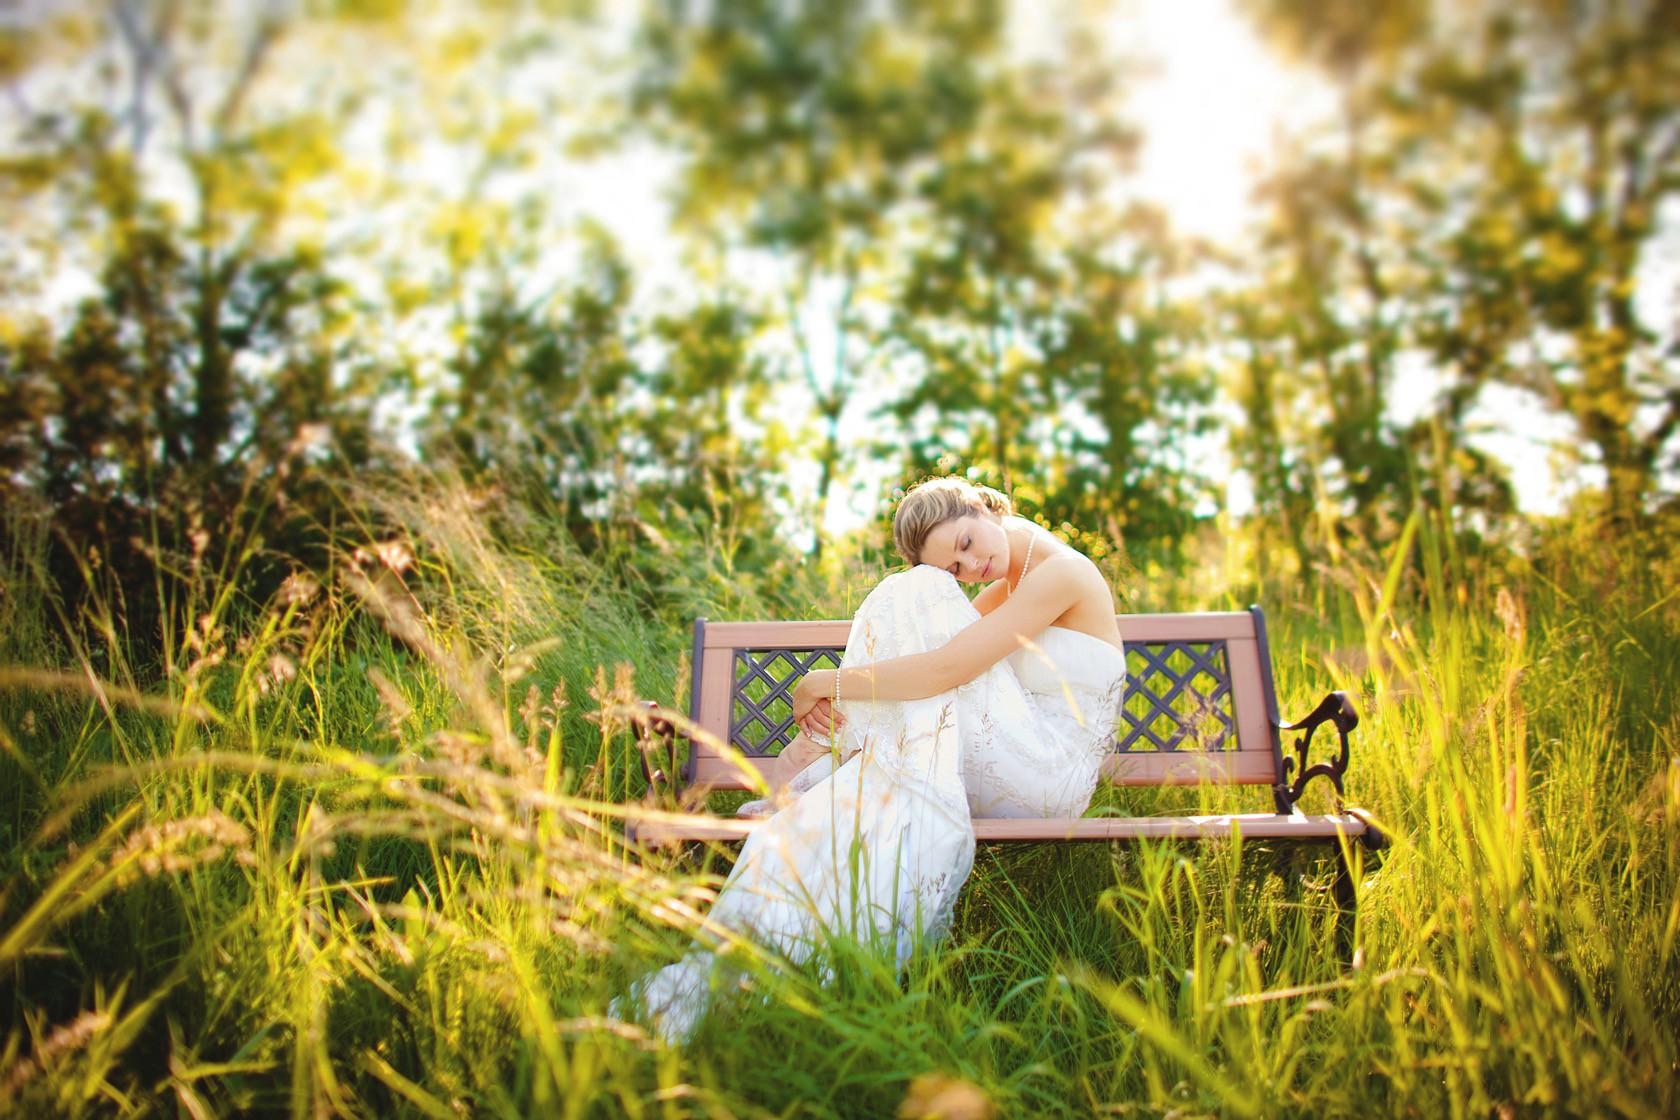 stephen sager photography 0002 fine art wedding photography